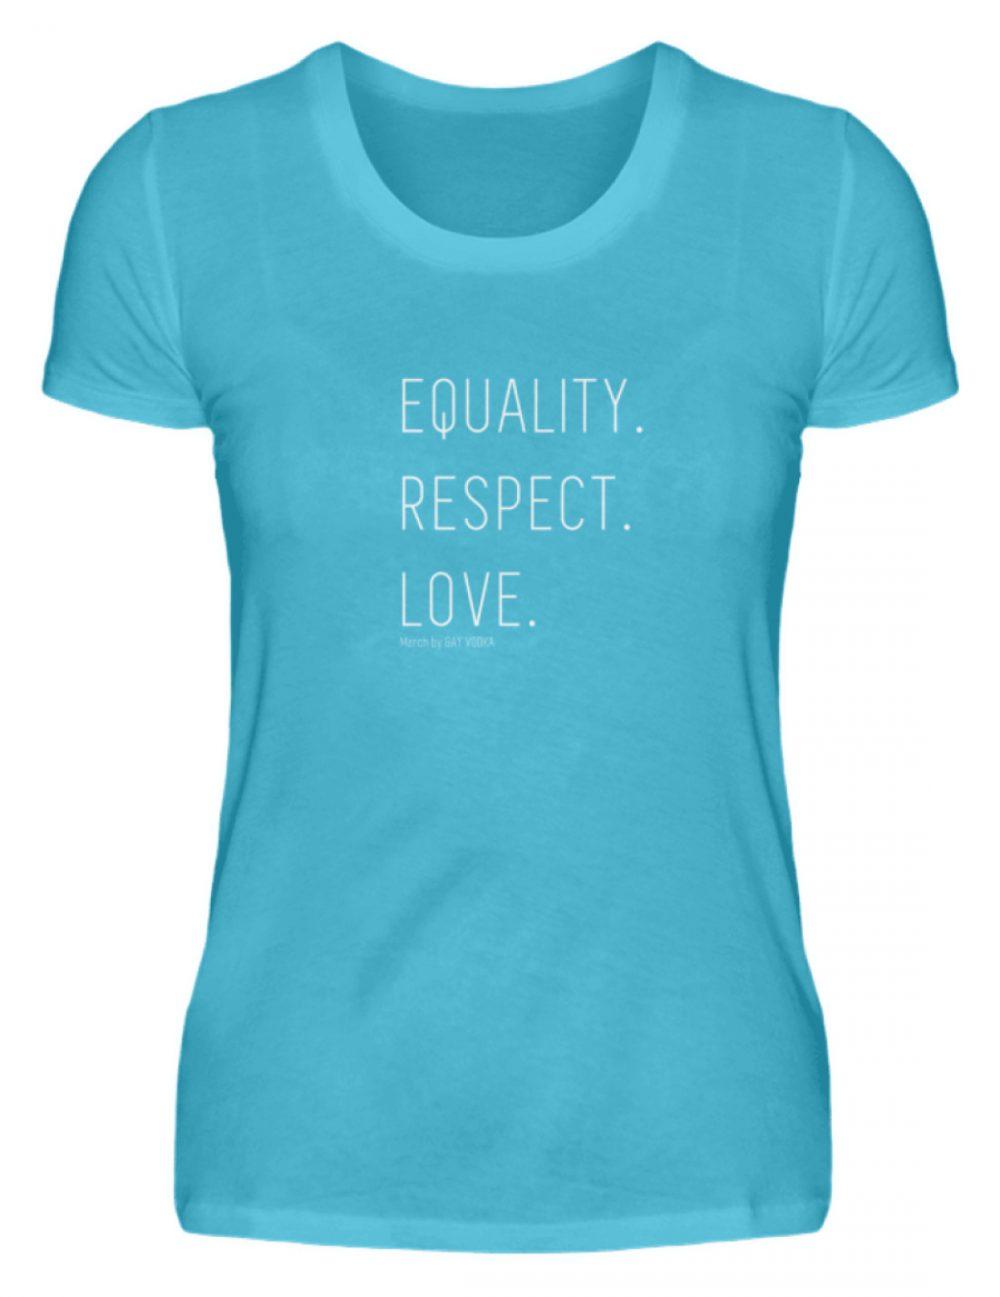 EQUALITY. RESPECT. LOVE. - Damenshirt-2462